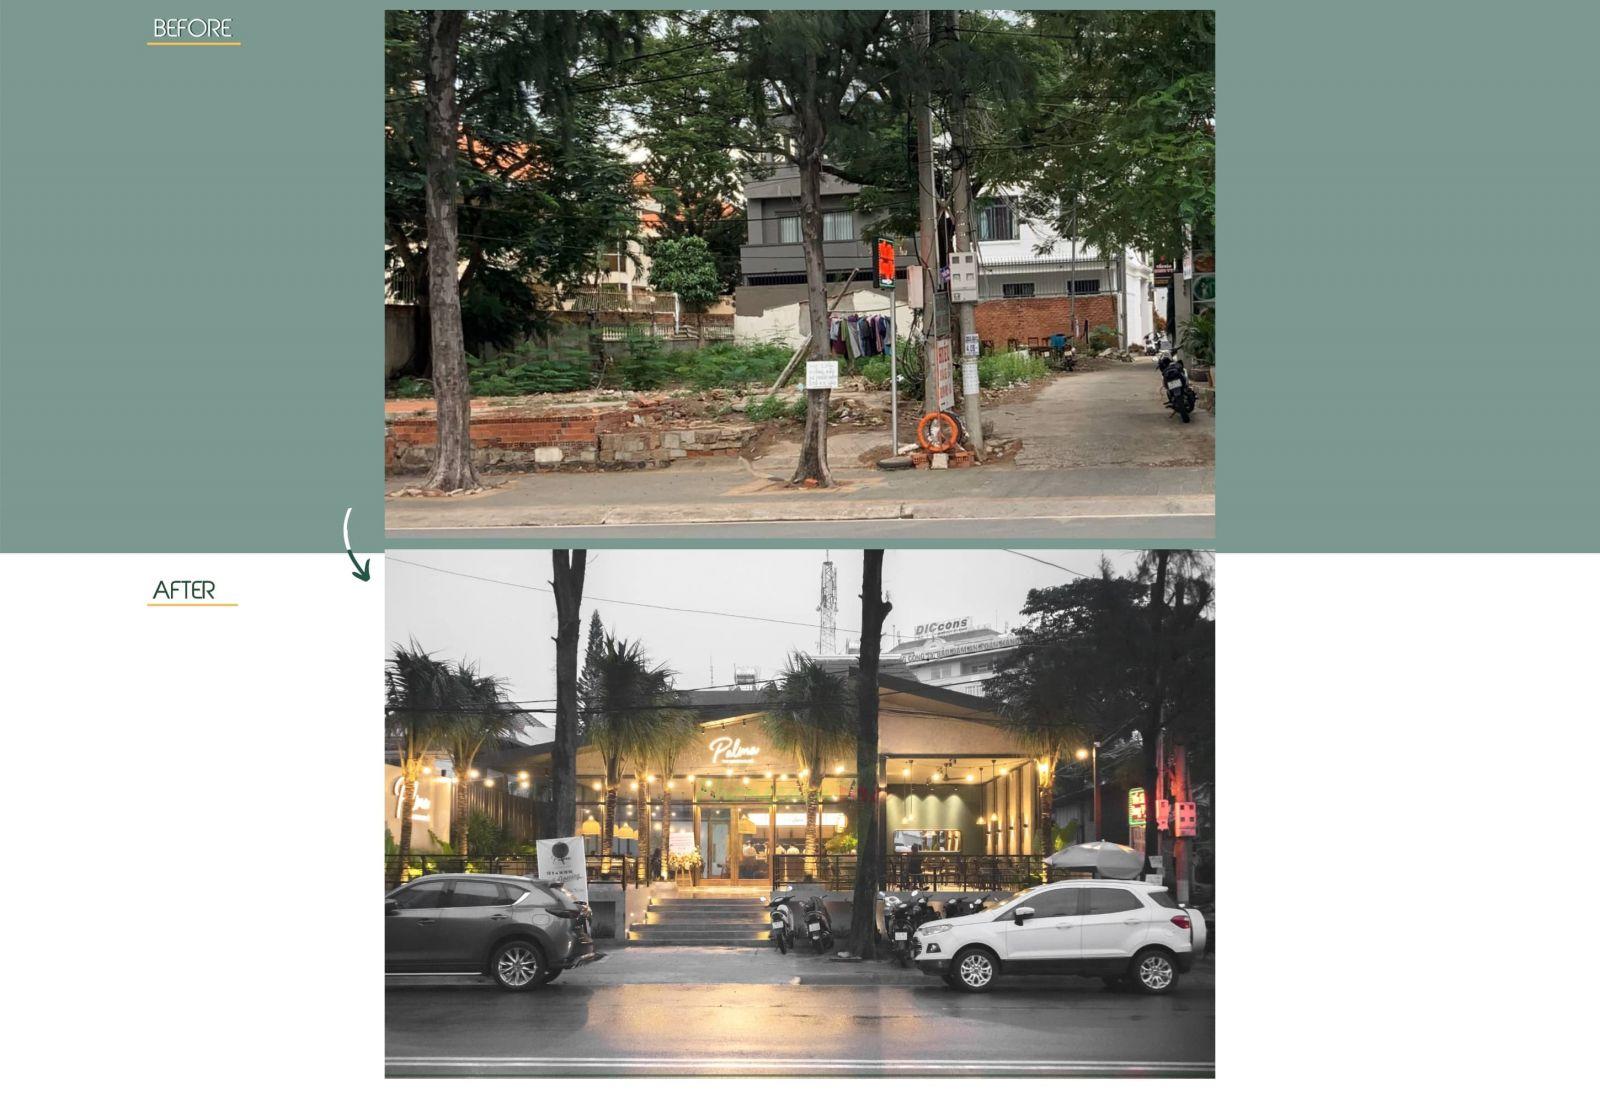 thi-cong-quan-cafe-palma-the-garden-cafe-vung-tau-54